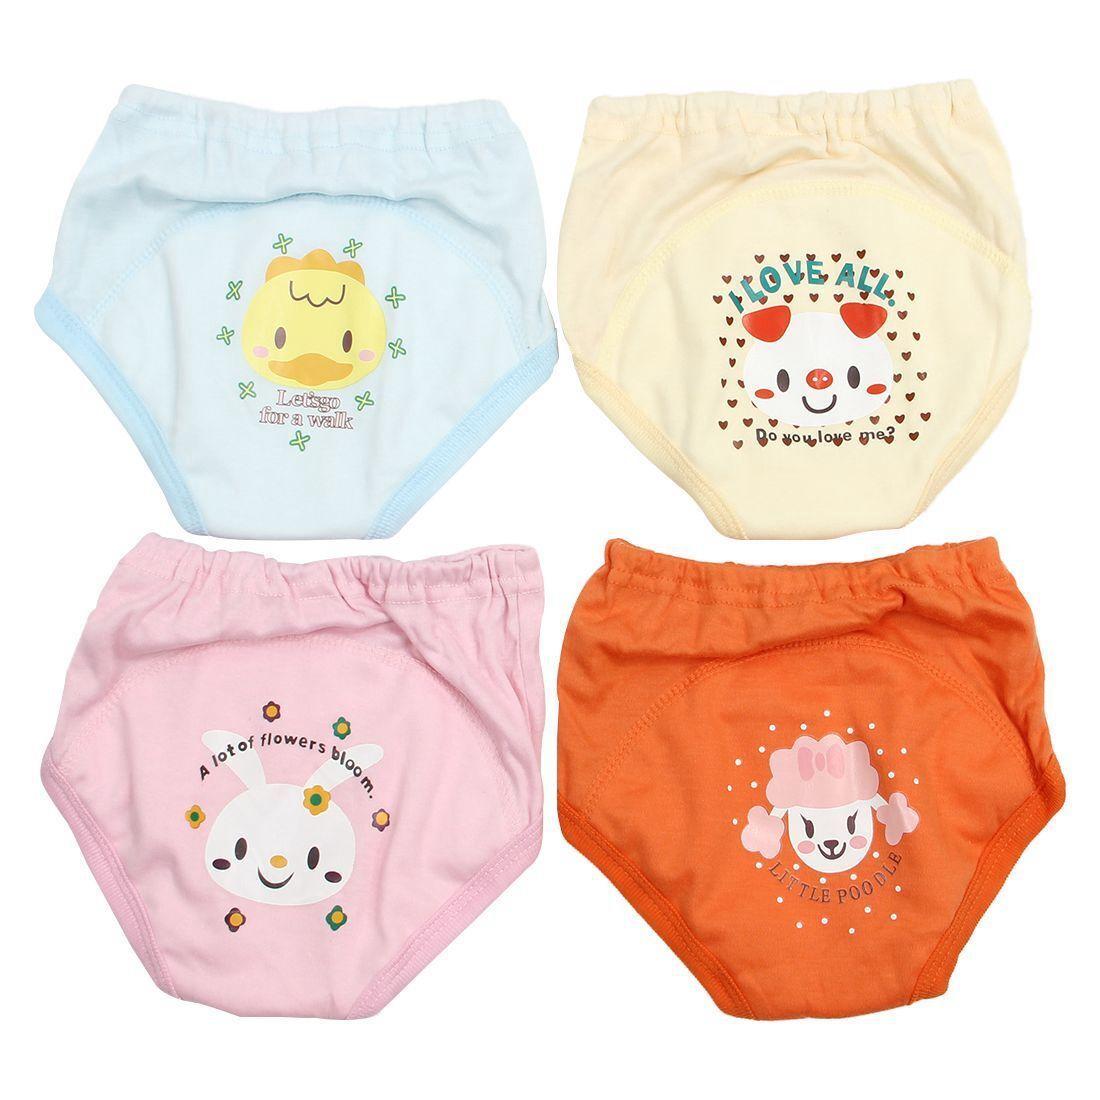 4x Baby Toddler Girls Boy Cute 4 Layers Waterproof Potty Training Pants Random. 4